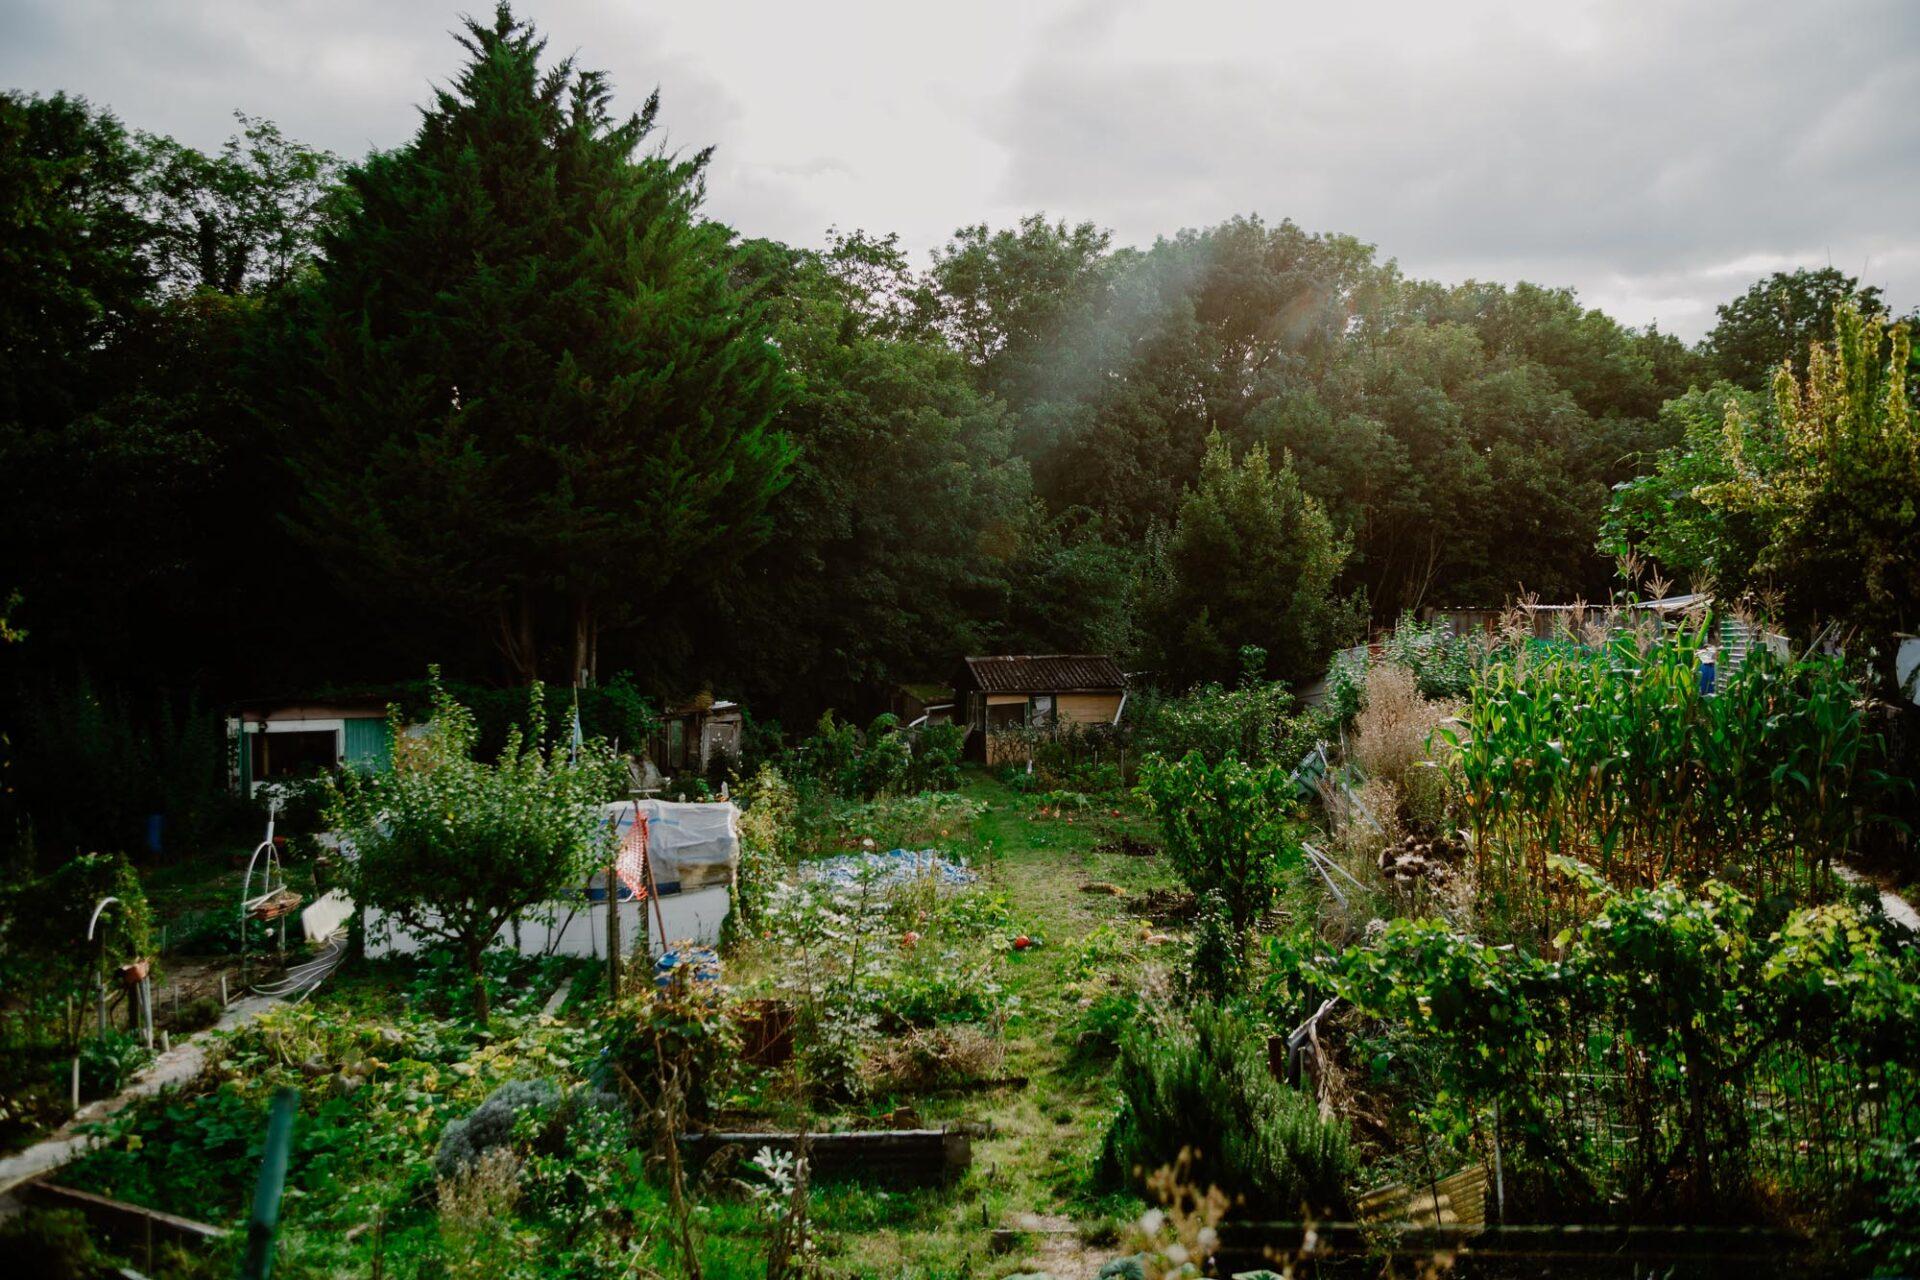 Jardins ouvriers aubervilliers 15 - Dagmara Bojenko - Eco-conscious Weddings, Births & Families